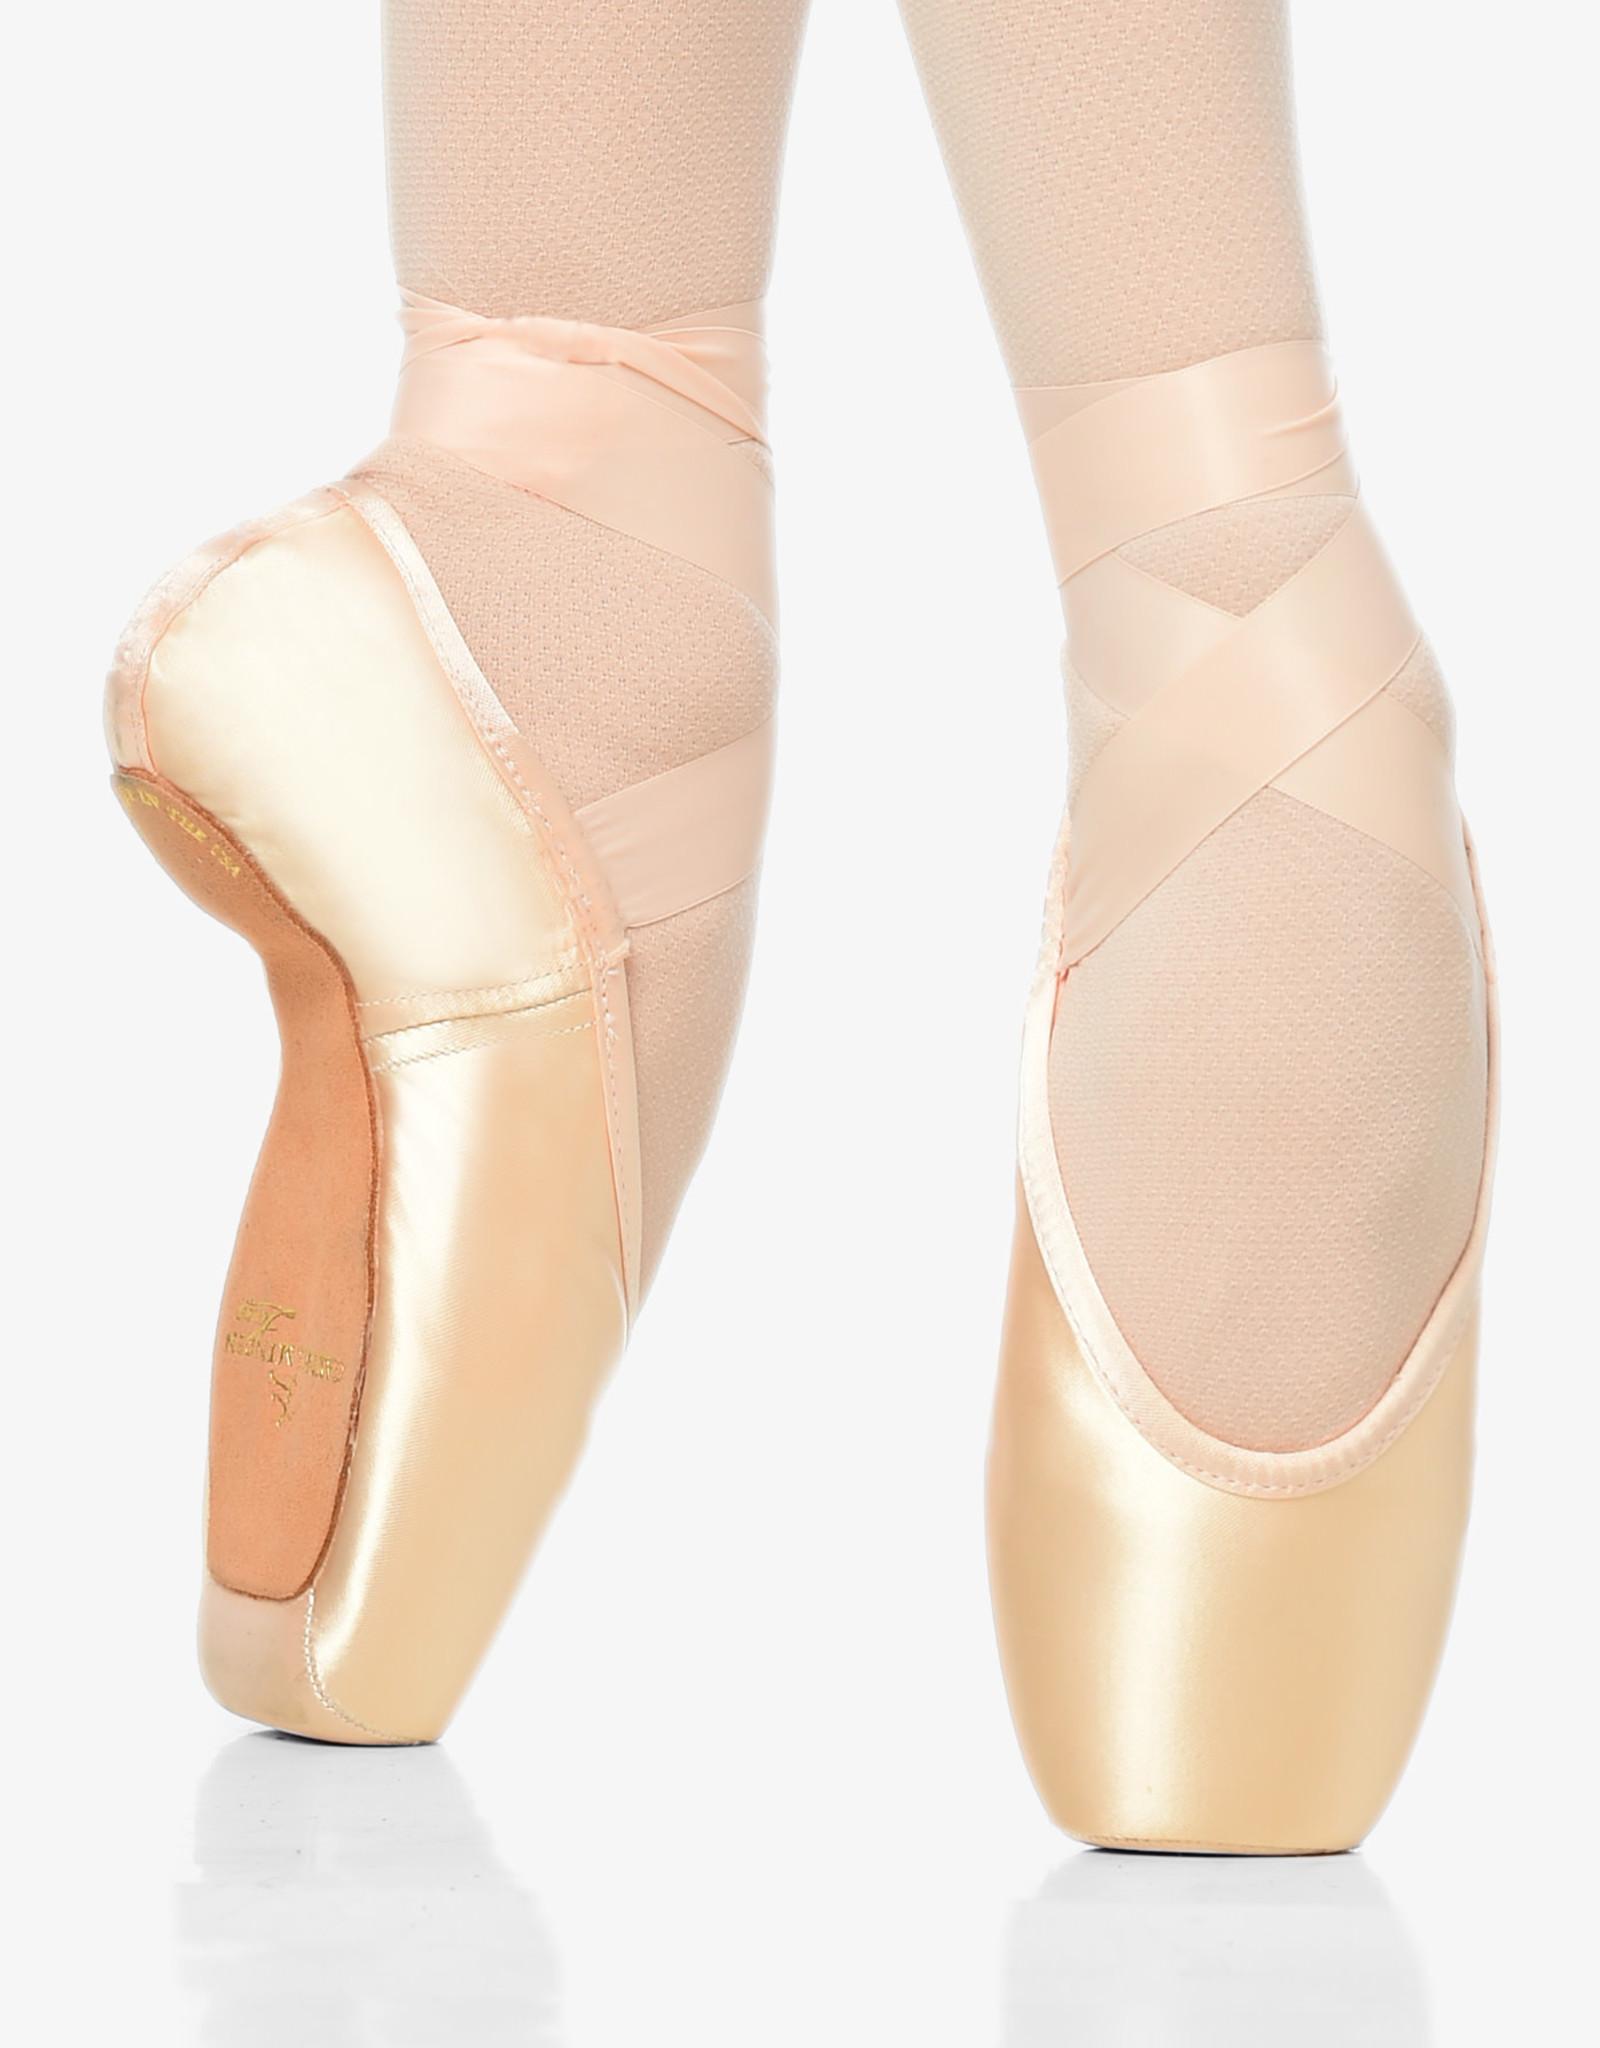 Gaynor Minden Sculpted Fit Supple Shank Pointe Shoe